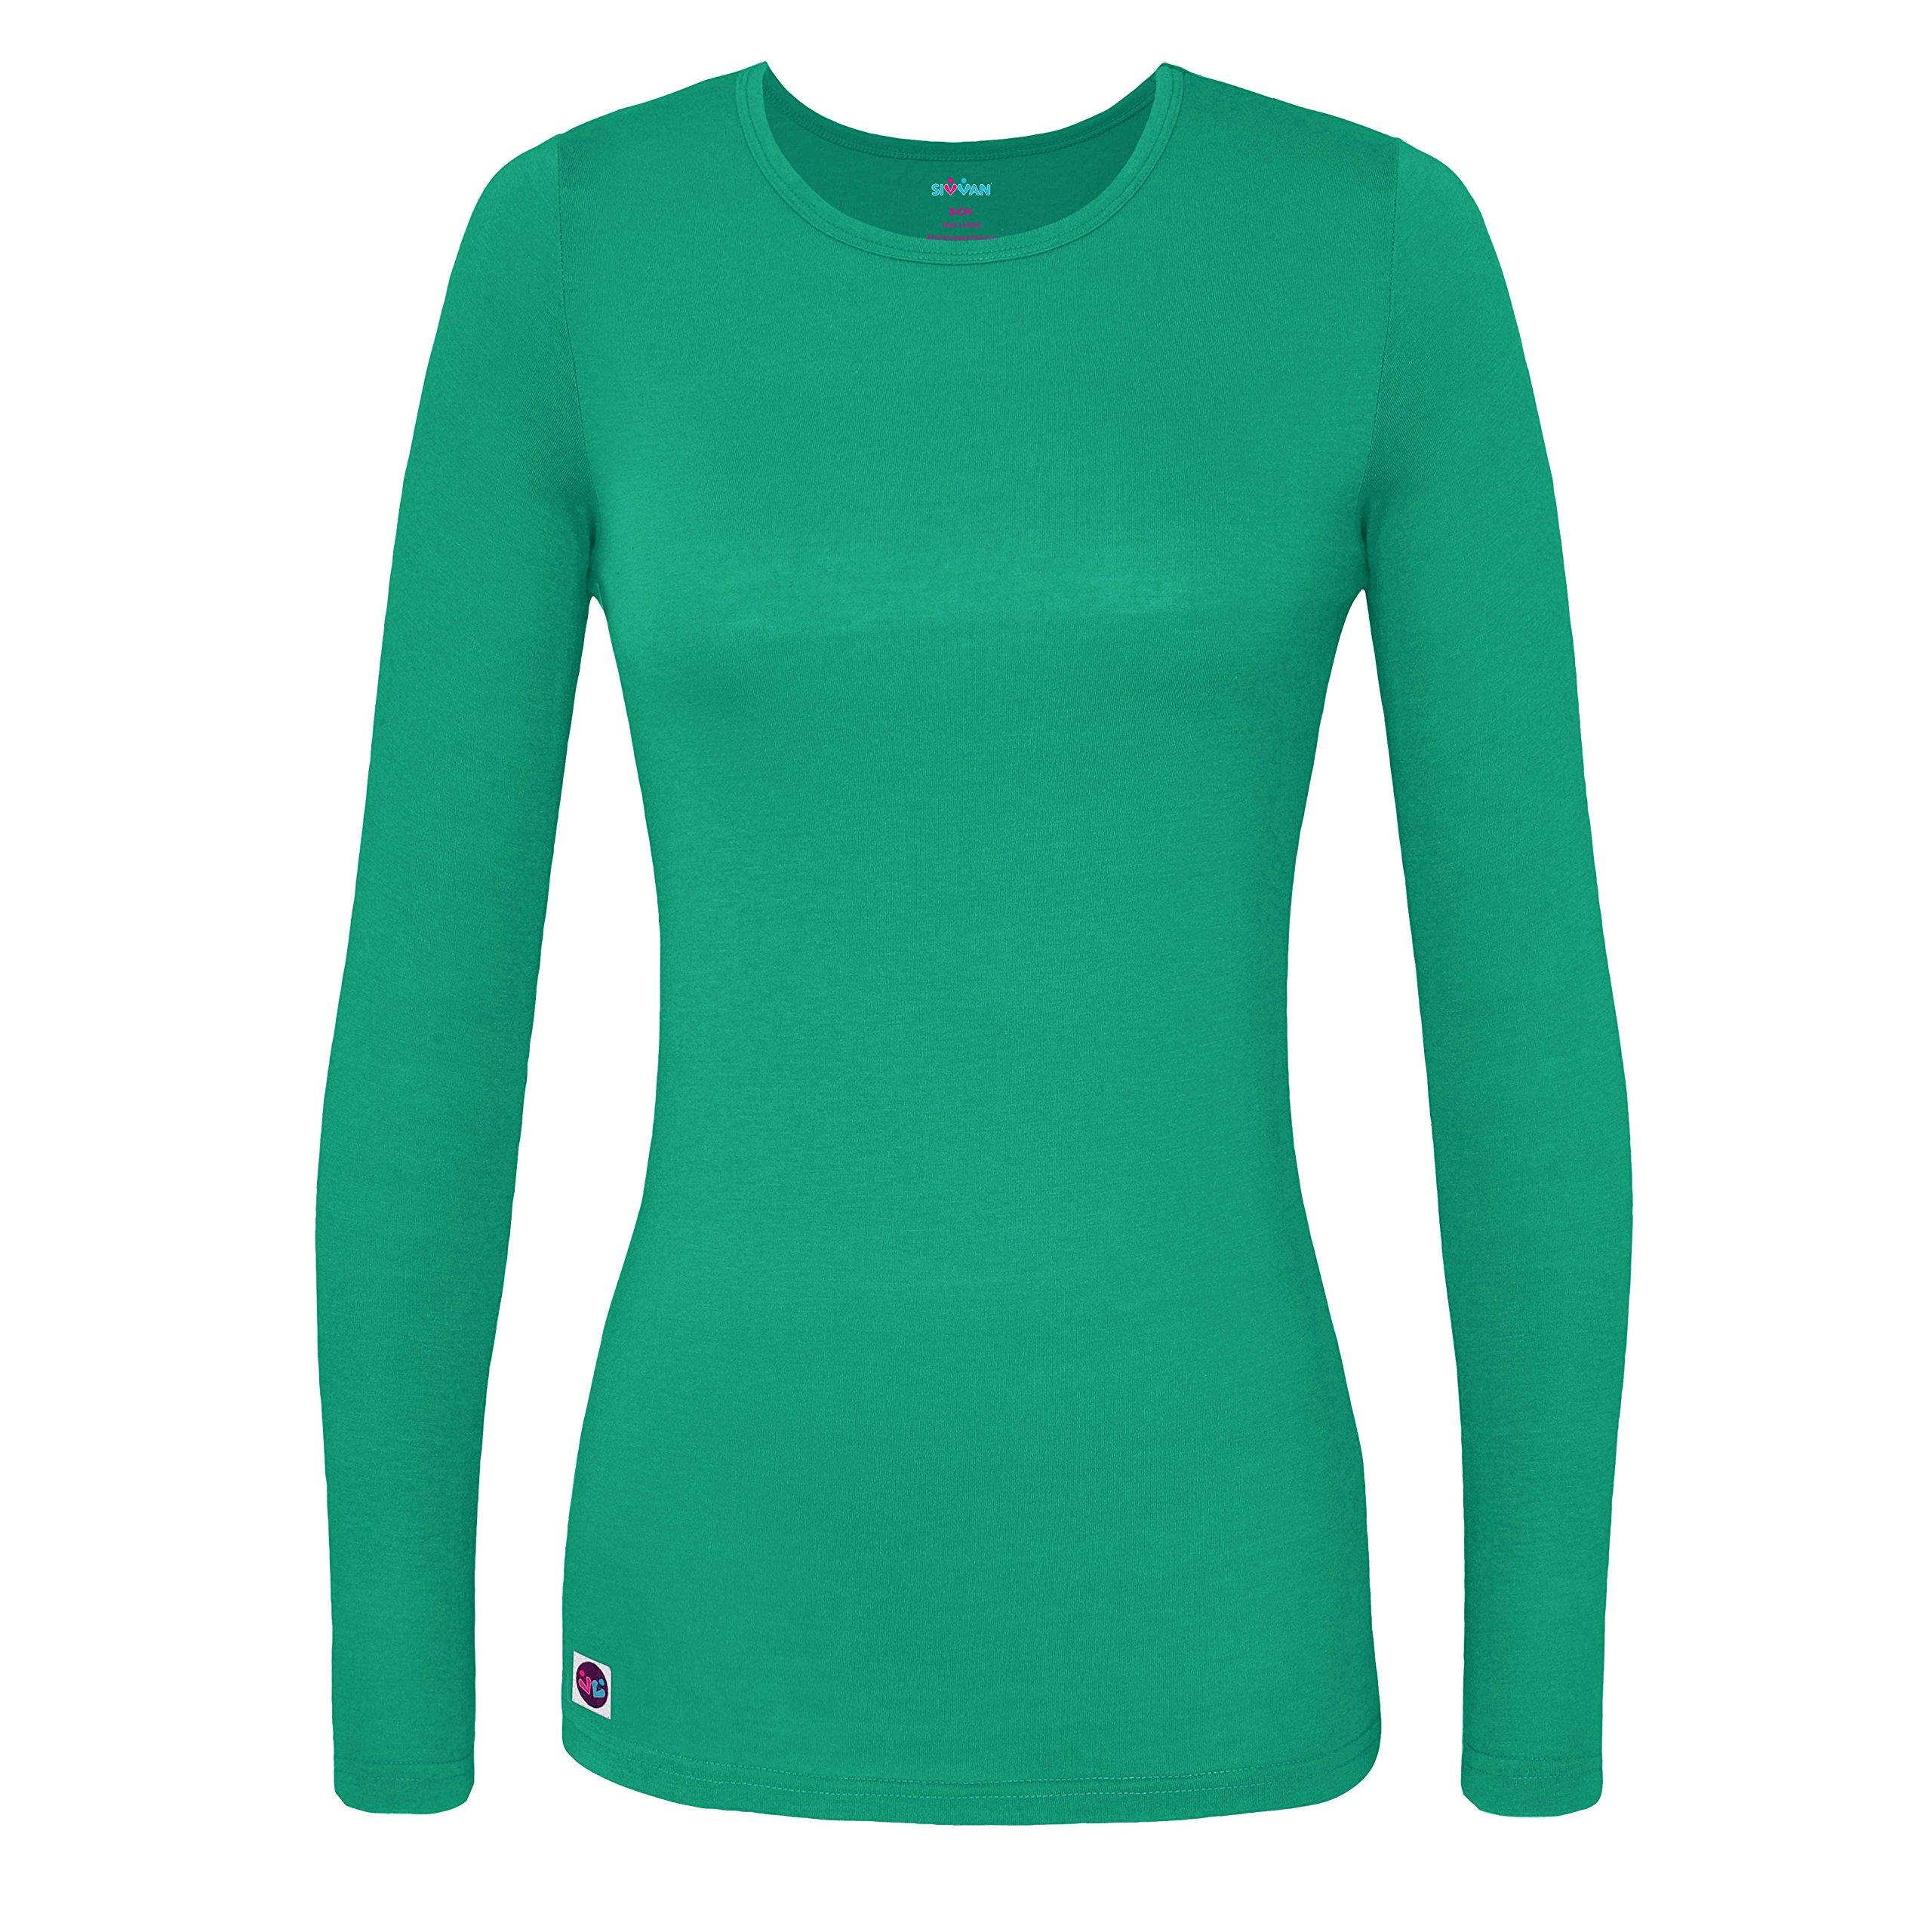 Sivvan Women's Comfort Long Sleeve T-Shirt/Underscrub Tee - S8500 - SMT - 3X